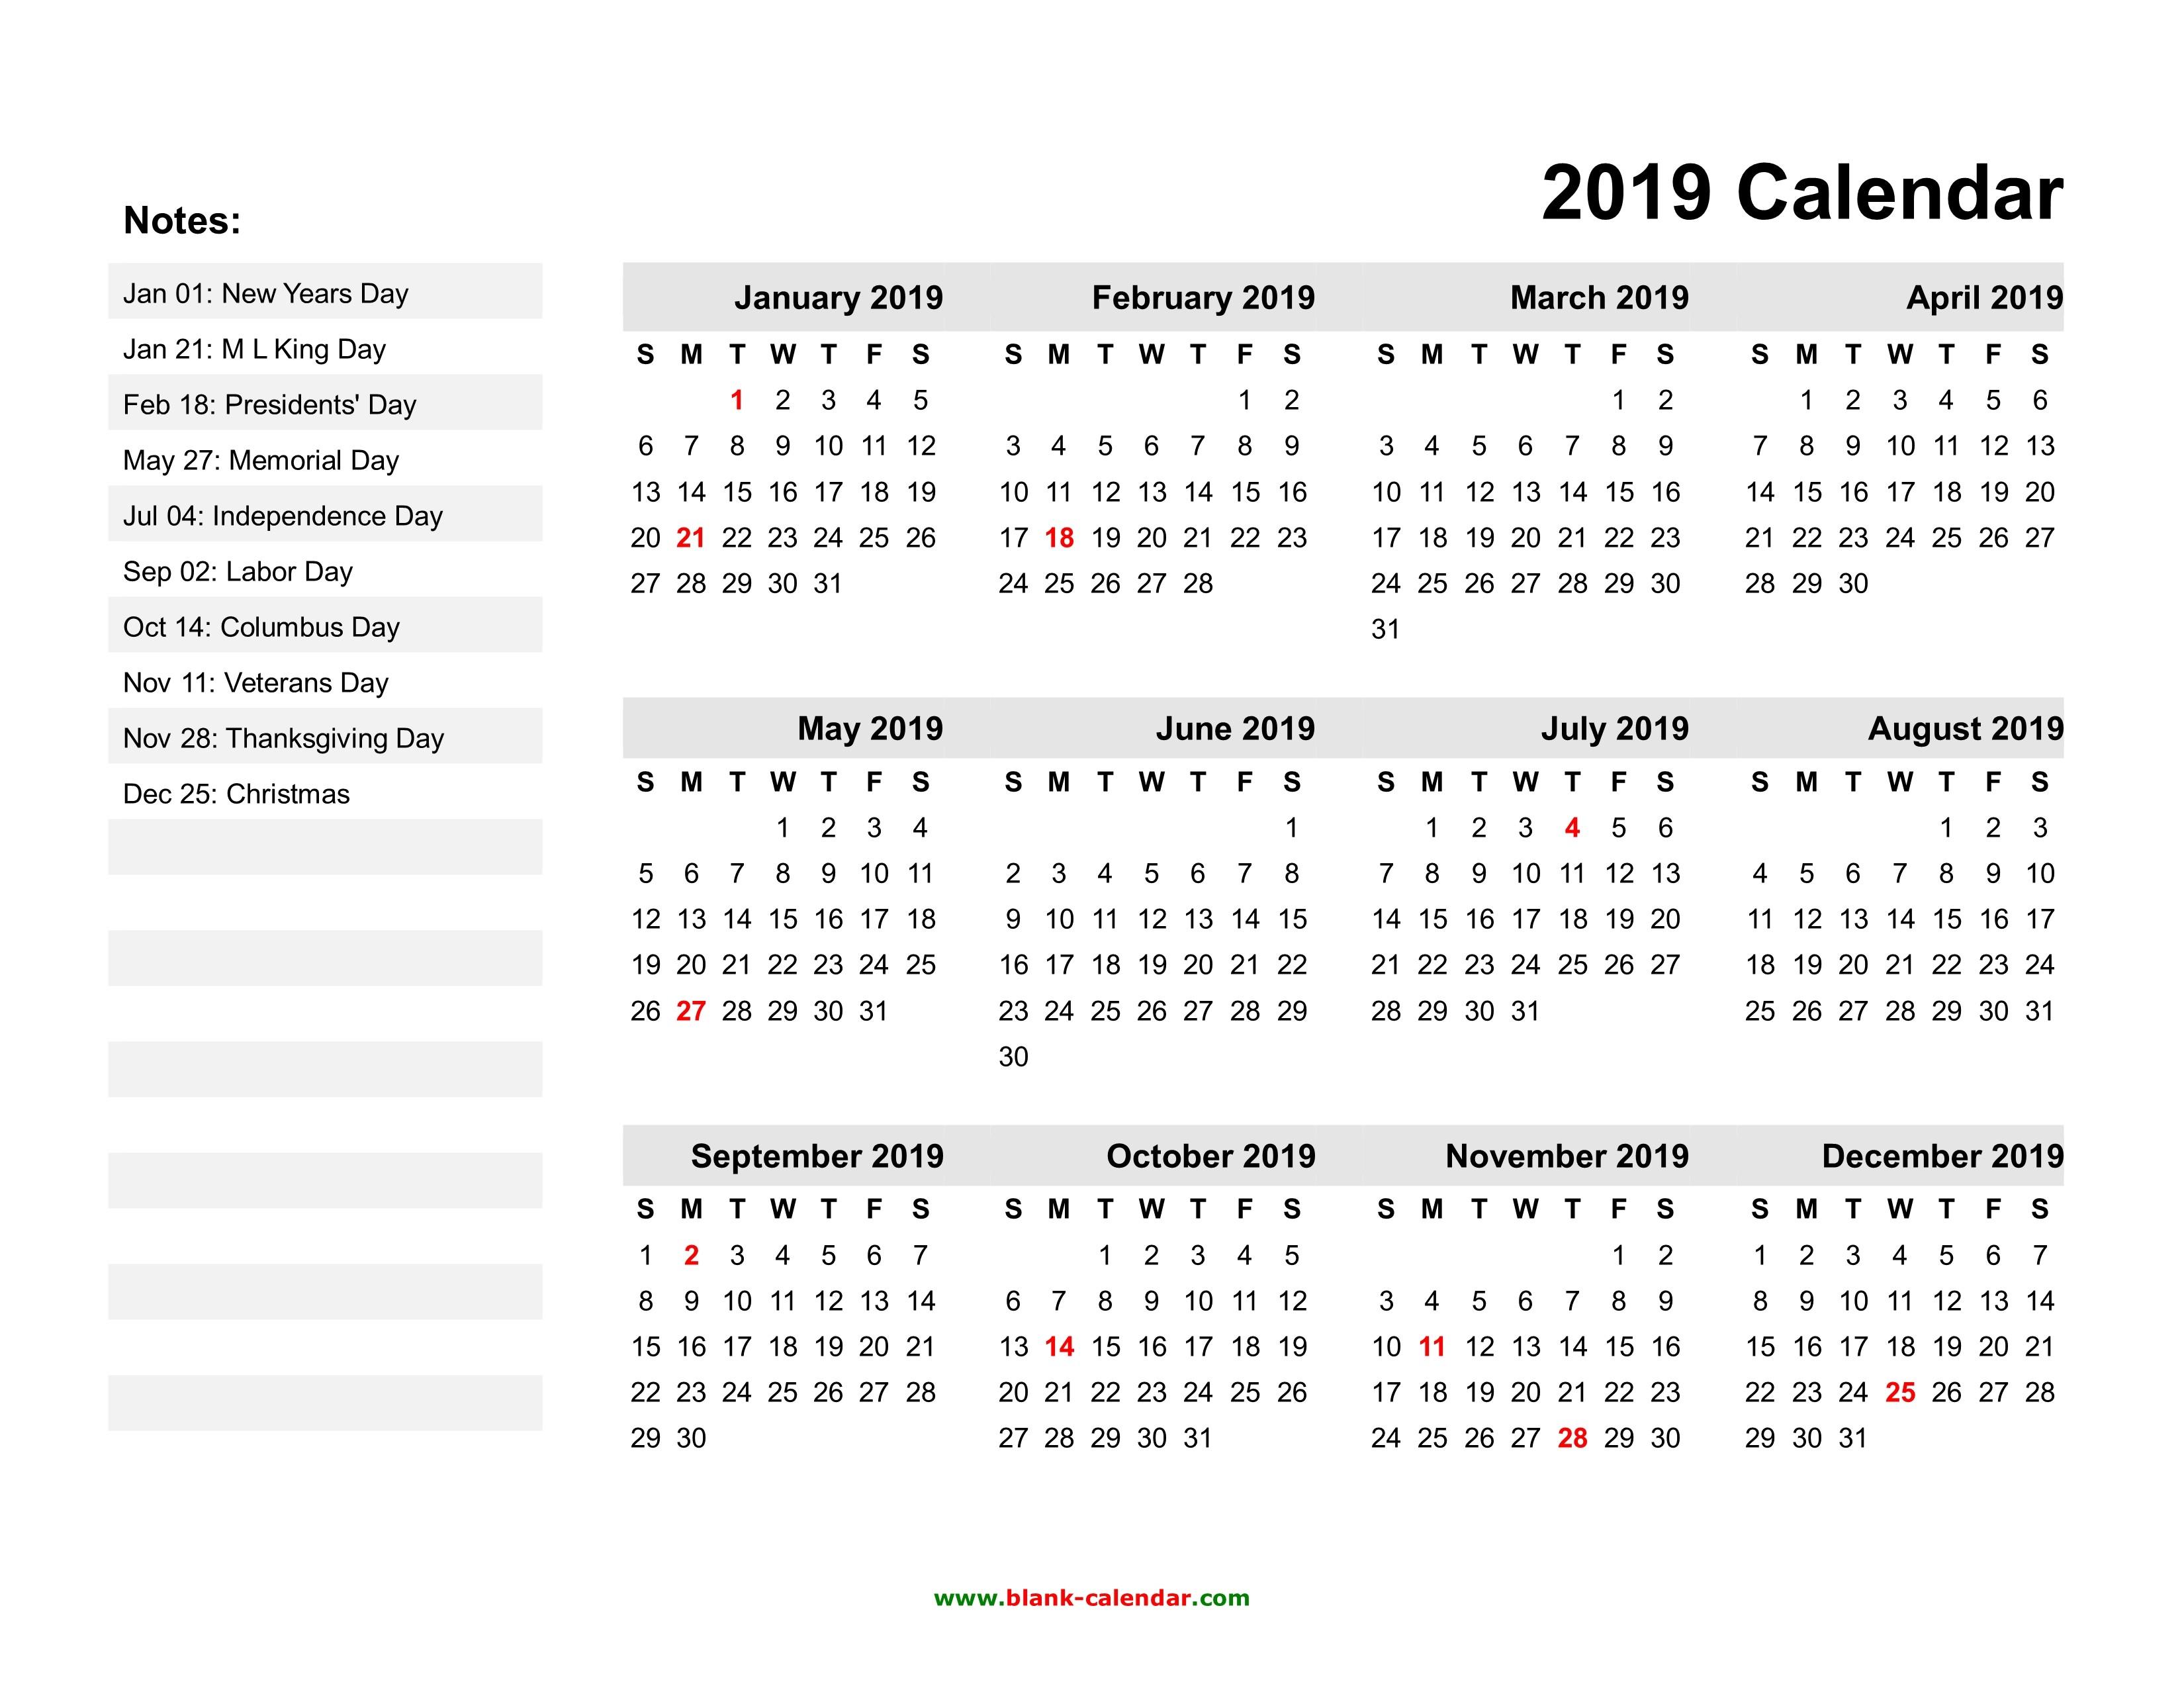 Calendar Template 2019 with Holidays